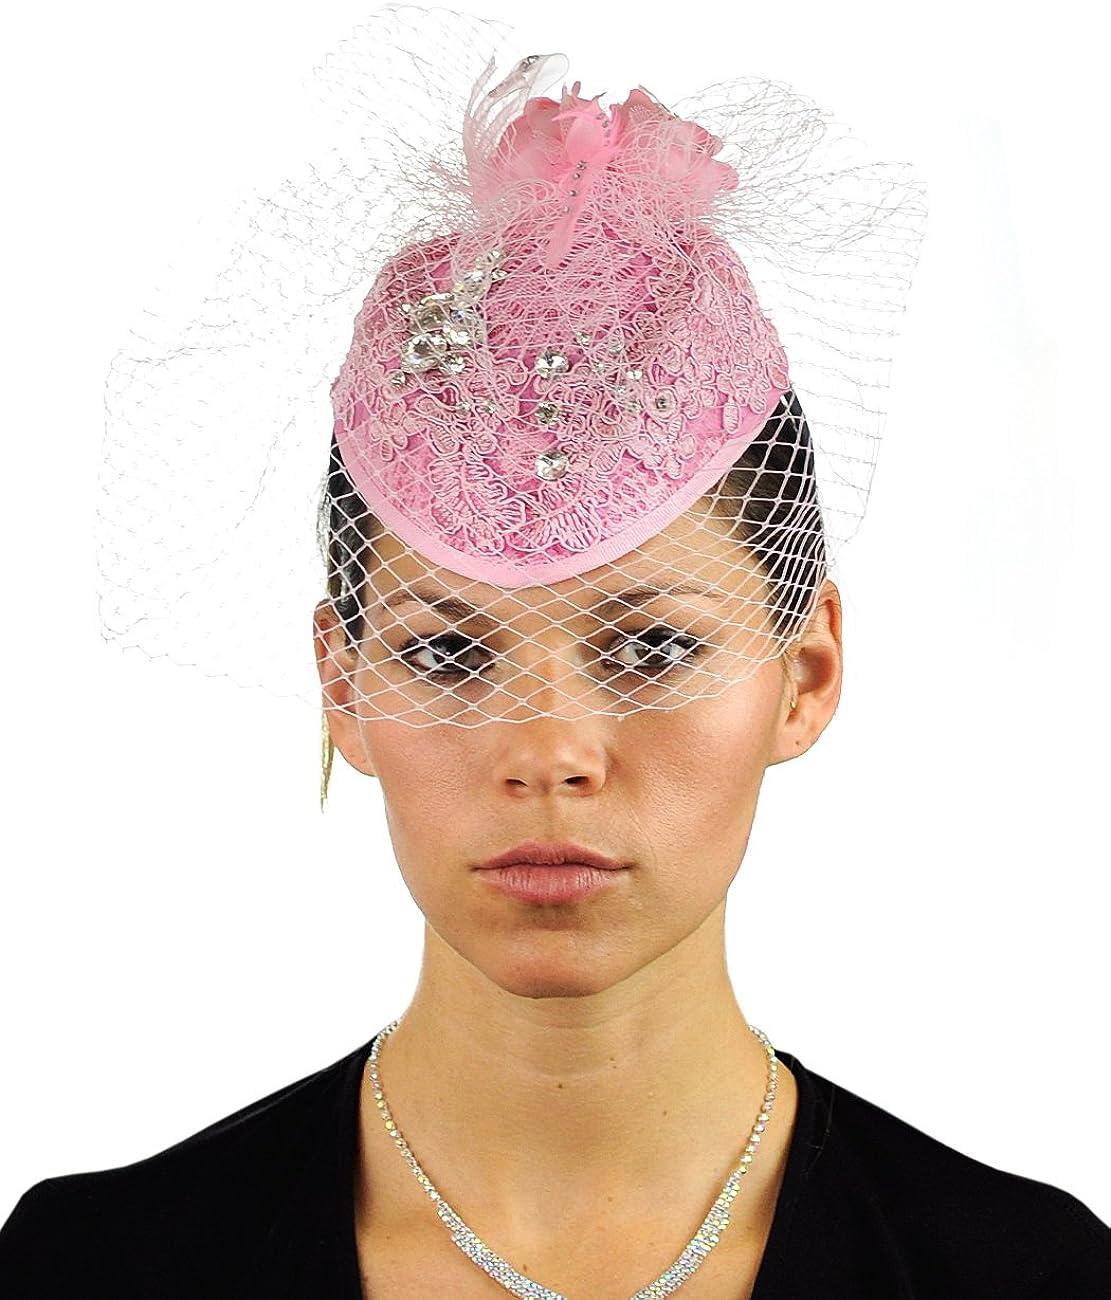 NYFASHION101 Cocktail Teardrop Sinamay Fascinator Hat w/Fish Net & Rhinestones, Pink